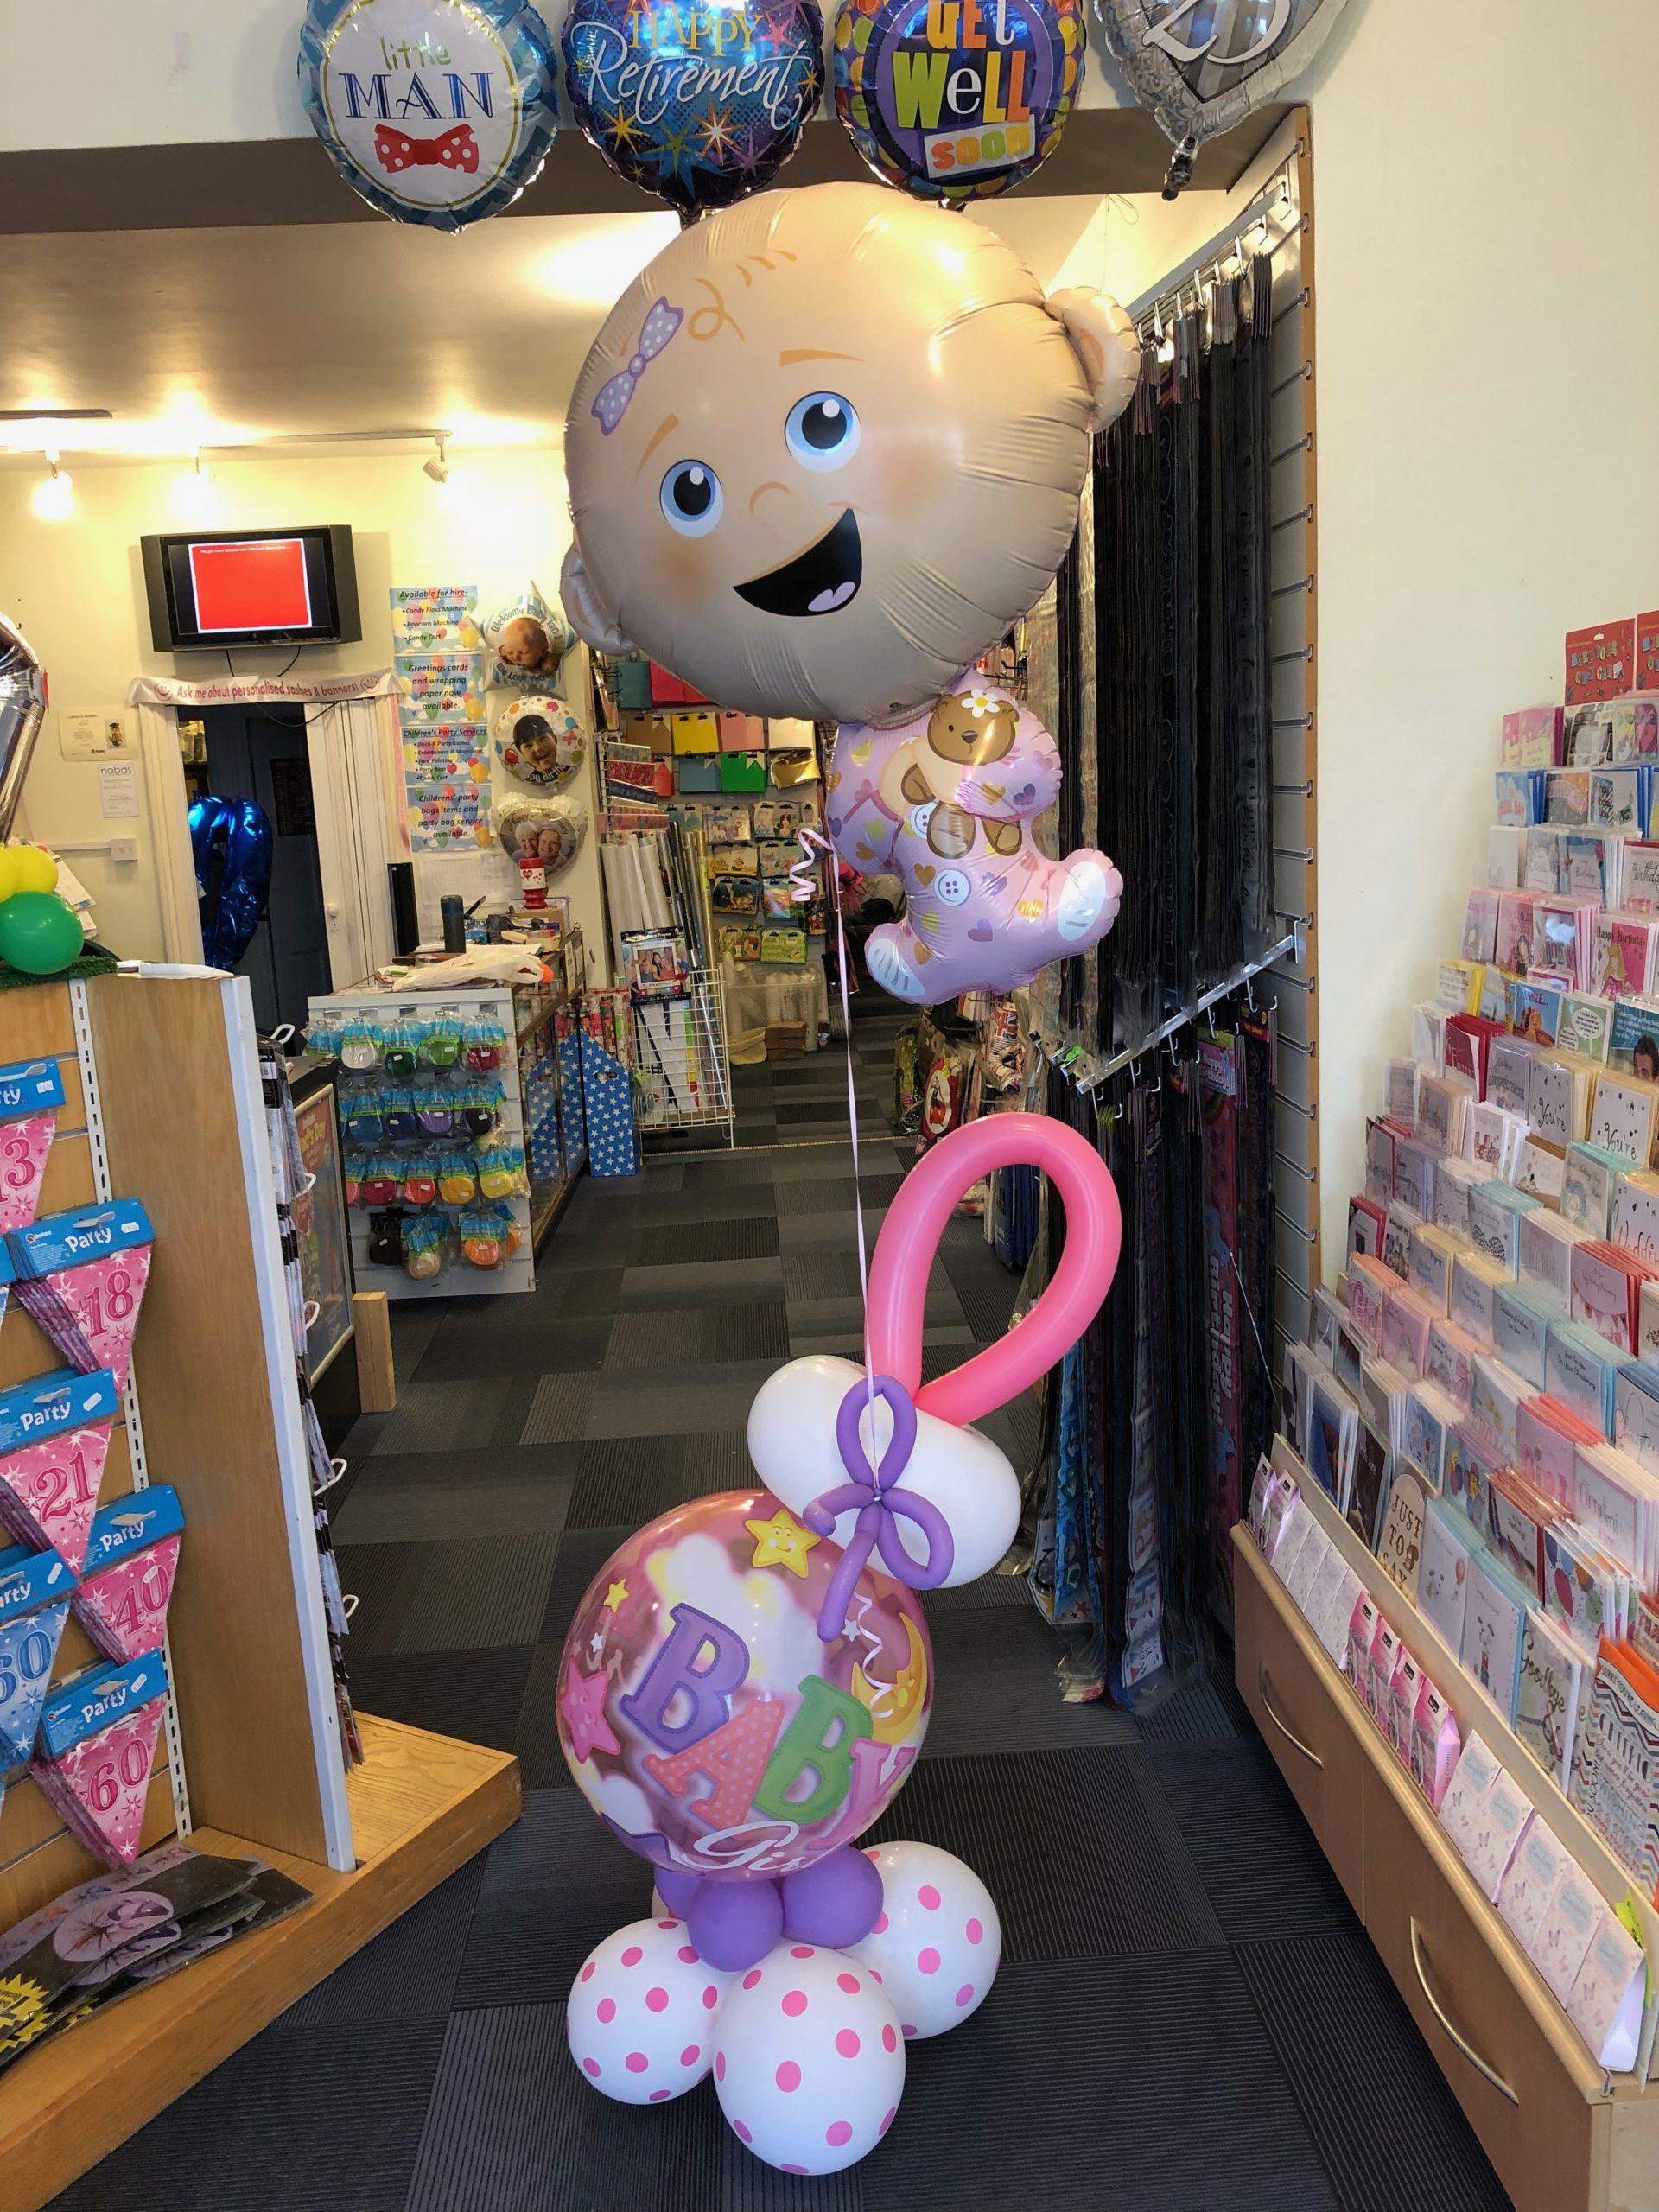 Balloon baby girl and balloon rattle